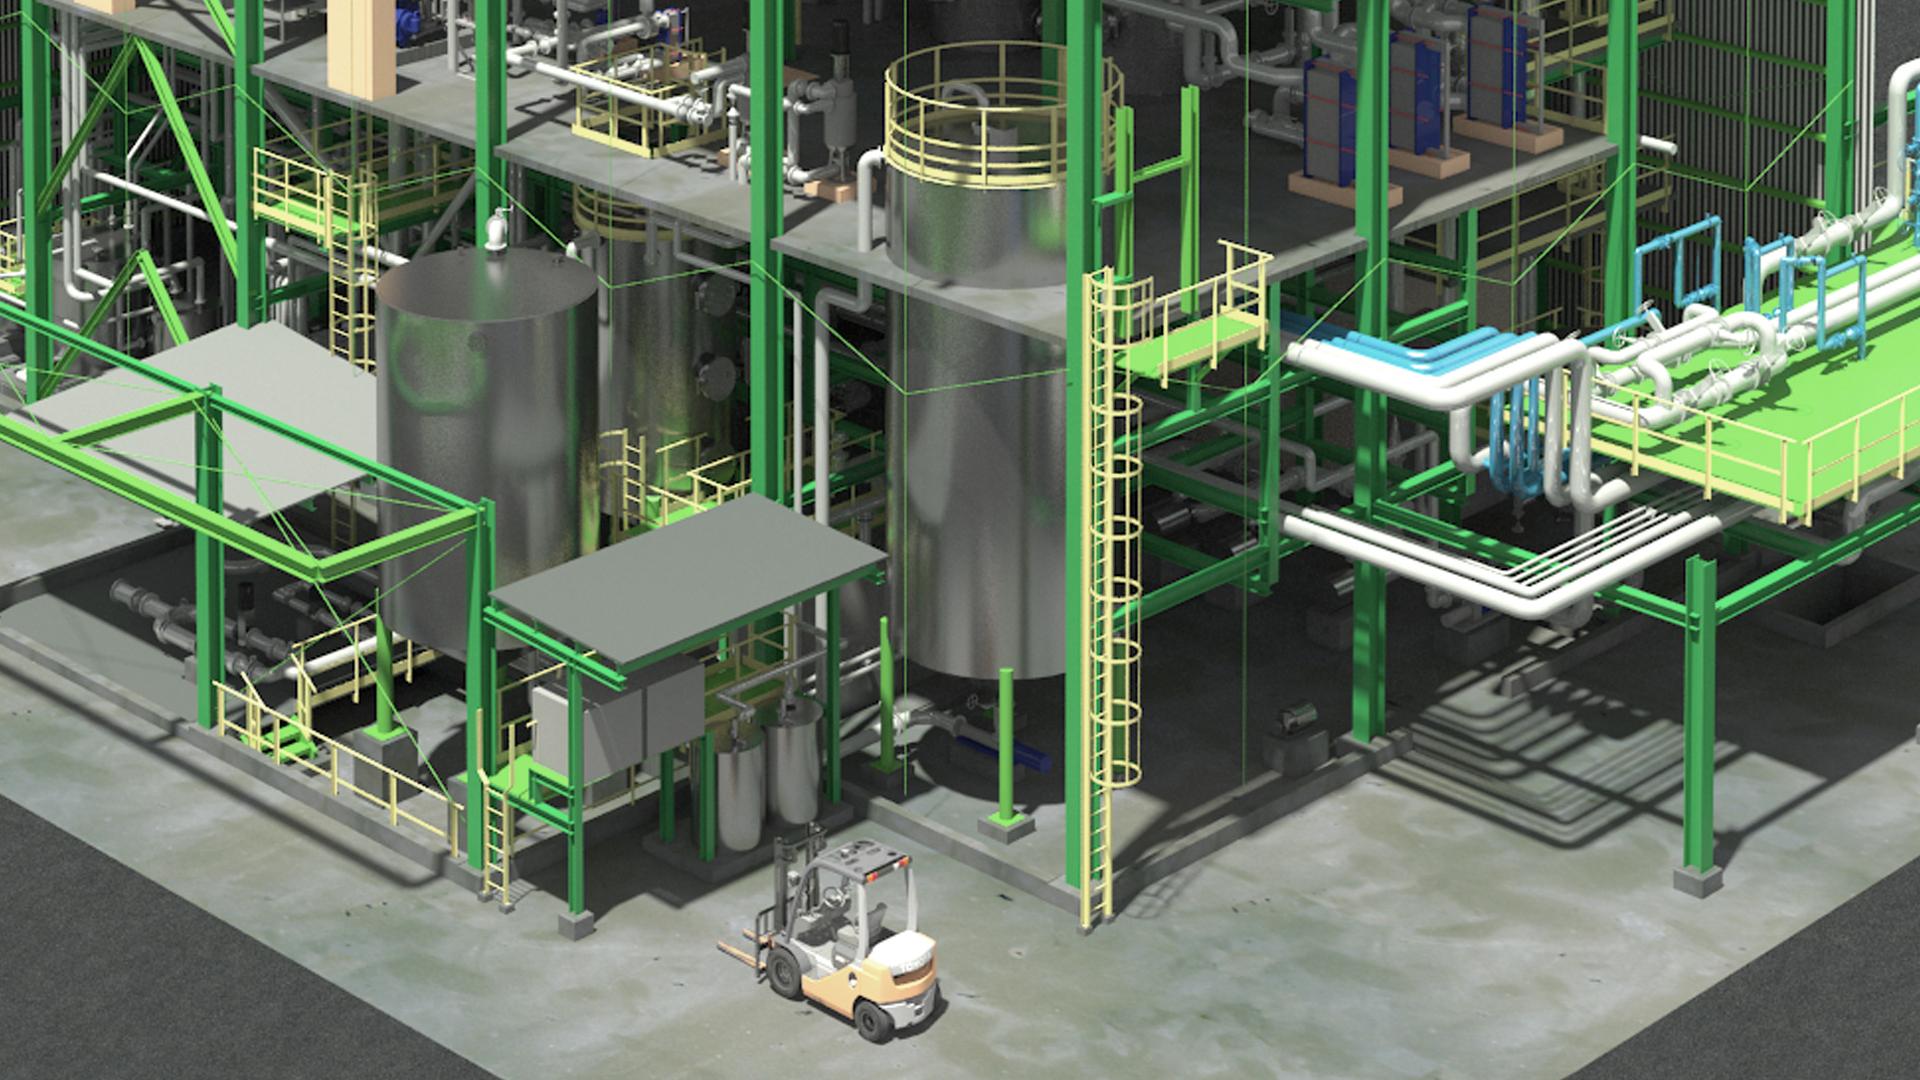 Render y Arquitectura 3D Industrial - GrupoAudiovisual 03